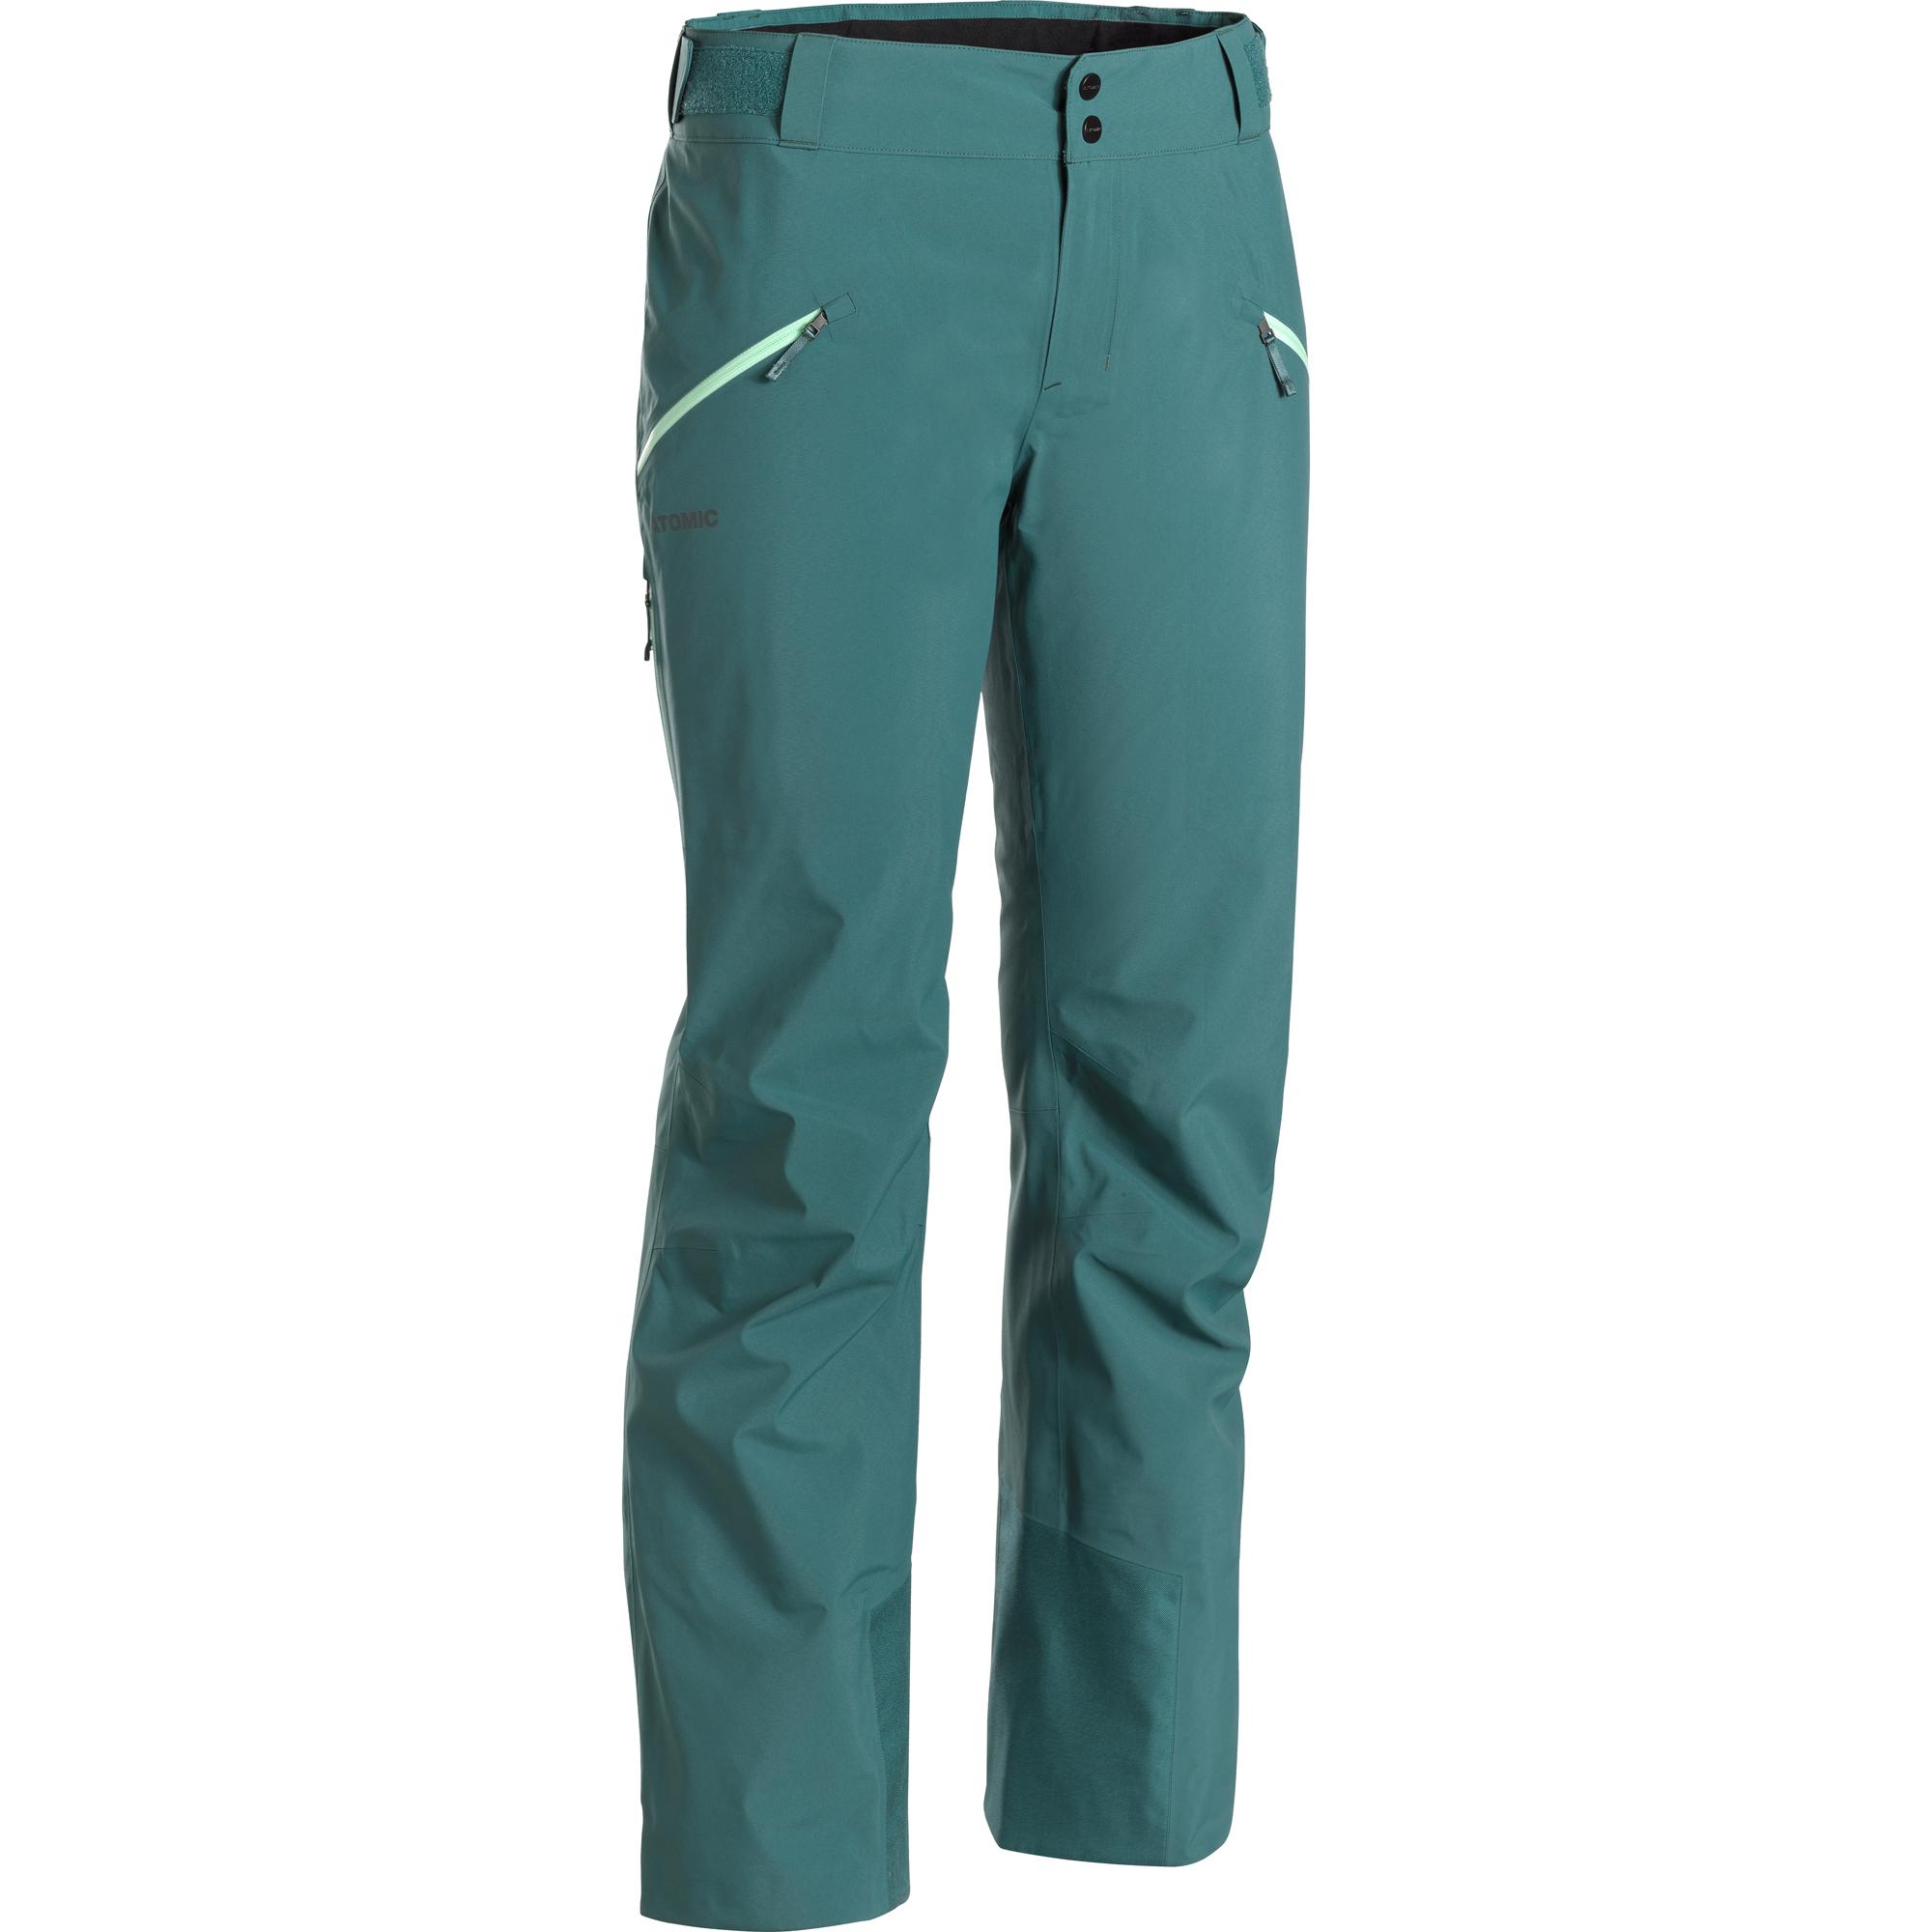 Pantalon Atomic Revent 3L GTX Vert Foncé